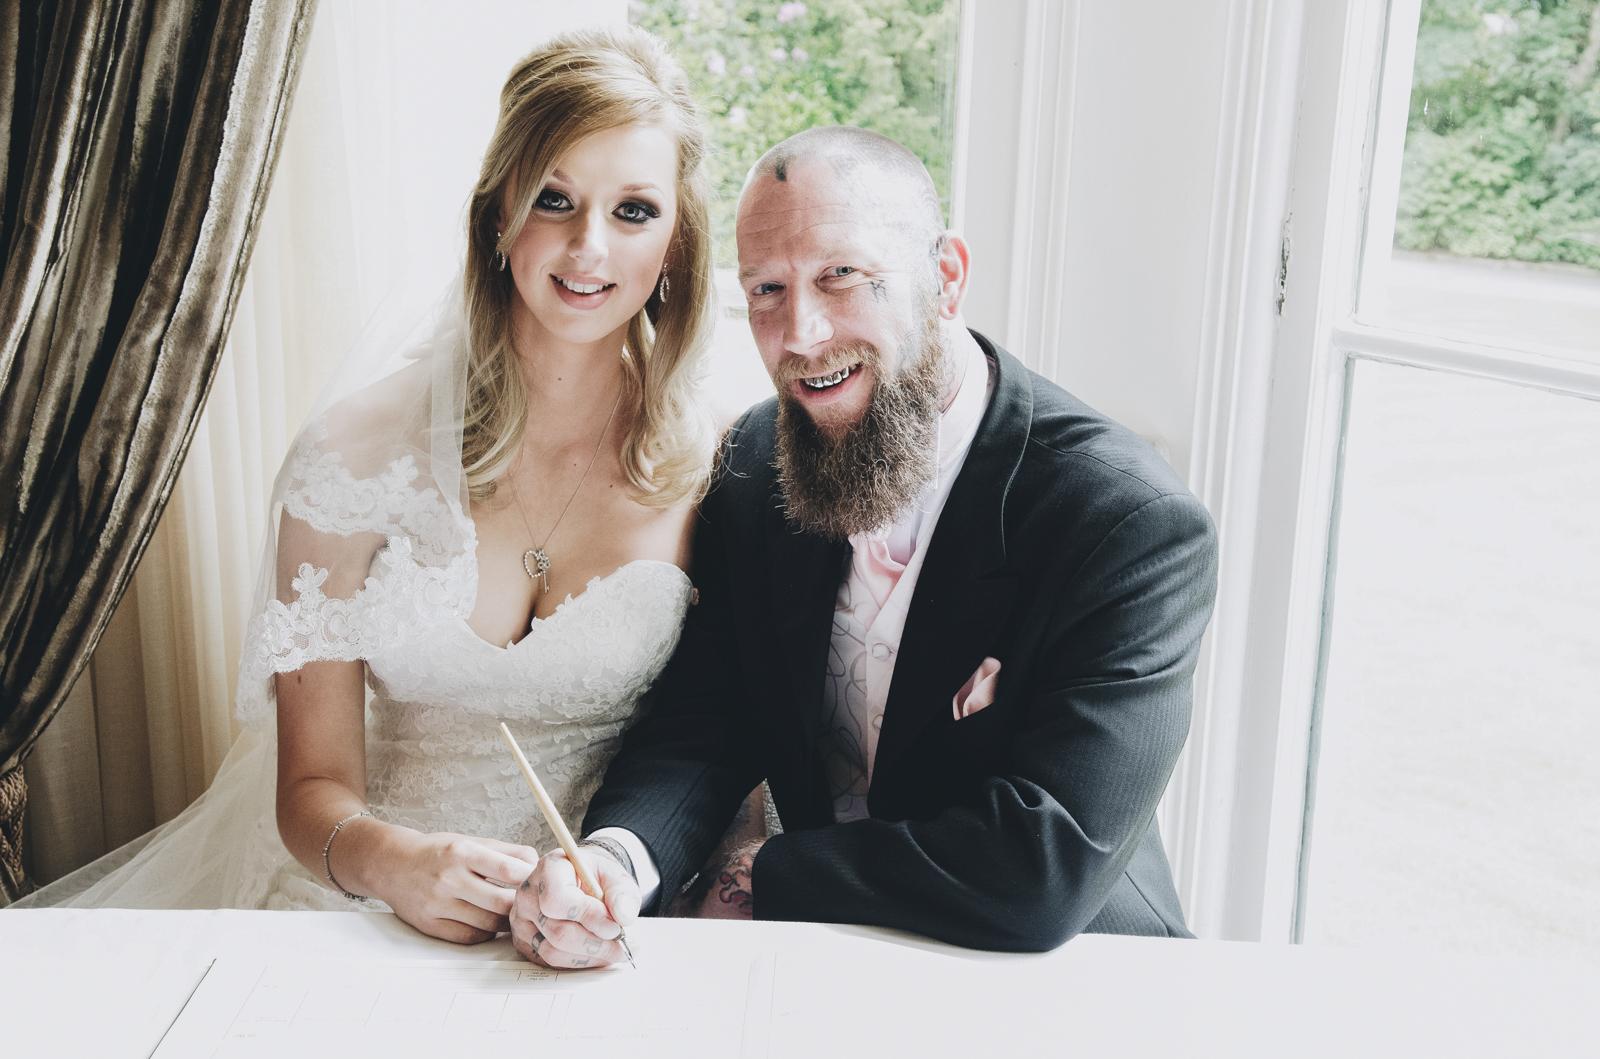 Alternative-North-West-Manchester-Wedding-Photography-Astley-bank-Wedding-skull-cake-tattooed-groom-15.jpg